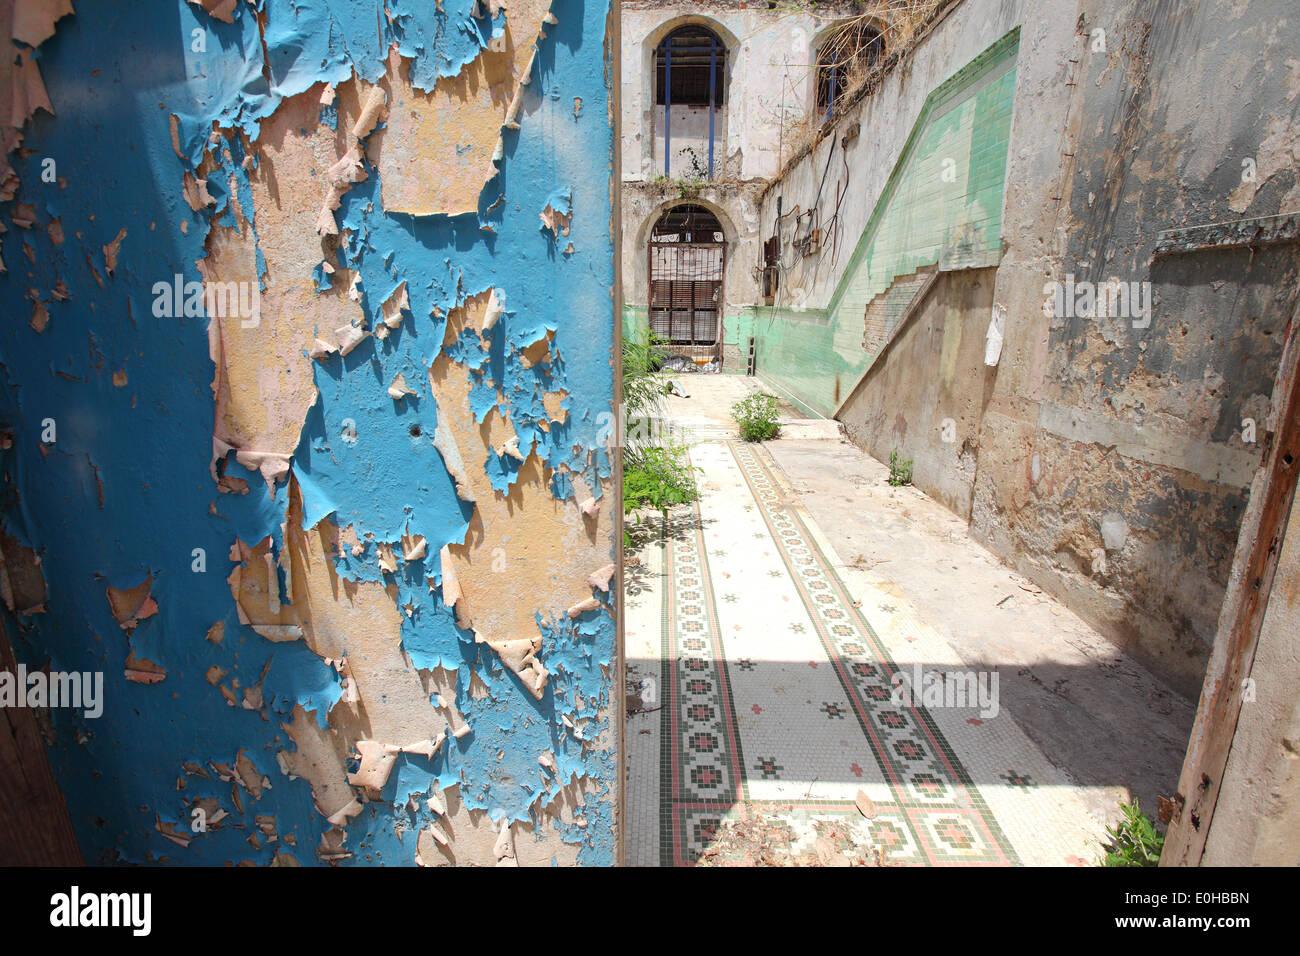 Casco Antiguo, old, house, housing, construction site, construct, broken down, Ciudad de Panamá, Panama city - Stock Image